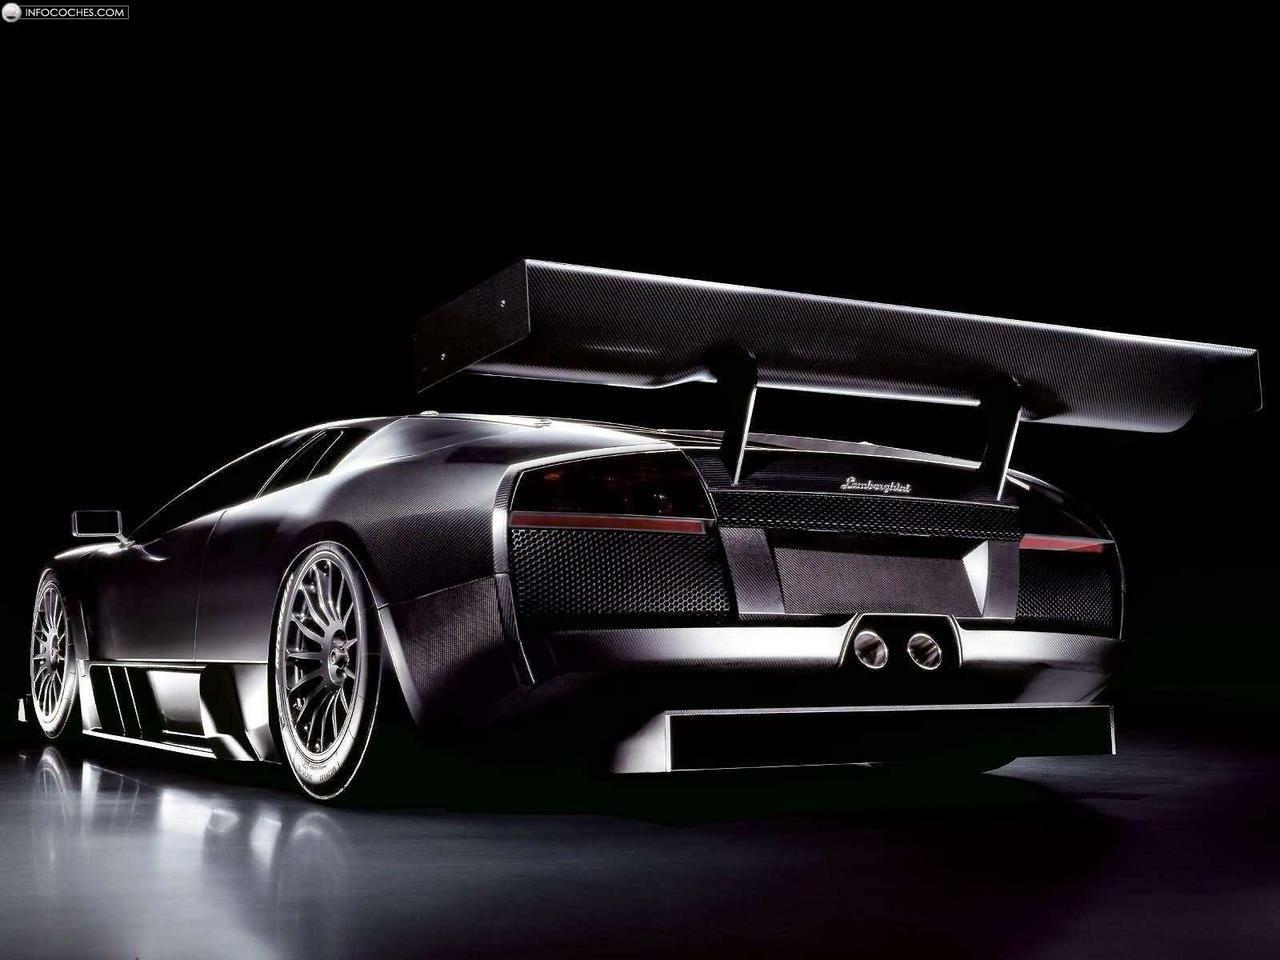 Lamborghini Murcielago RGT Sports Cars Disenoart The - Sports cars for 70000